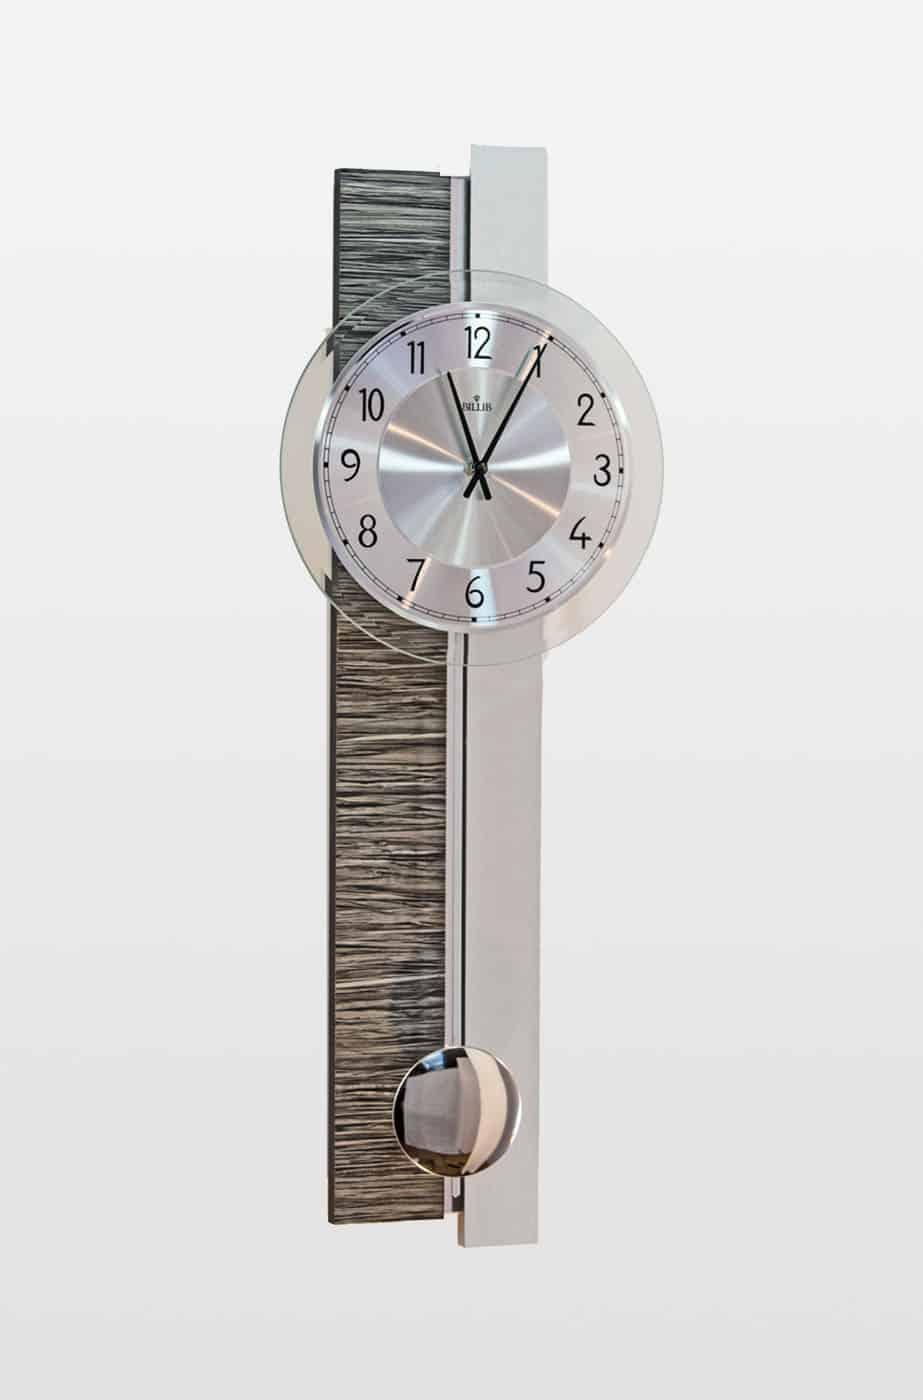 QC 9075 Contemporary wall clock